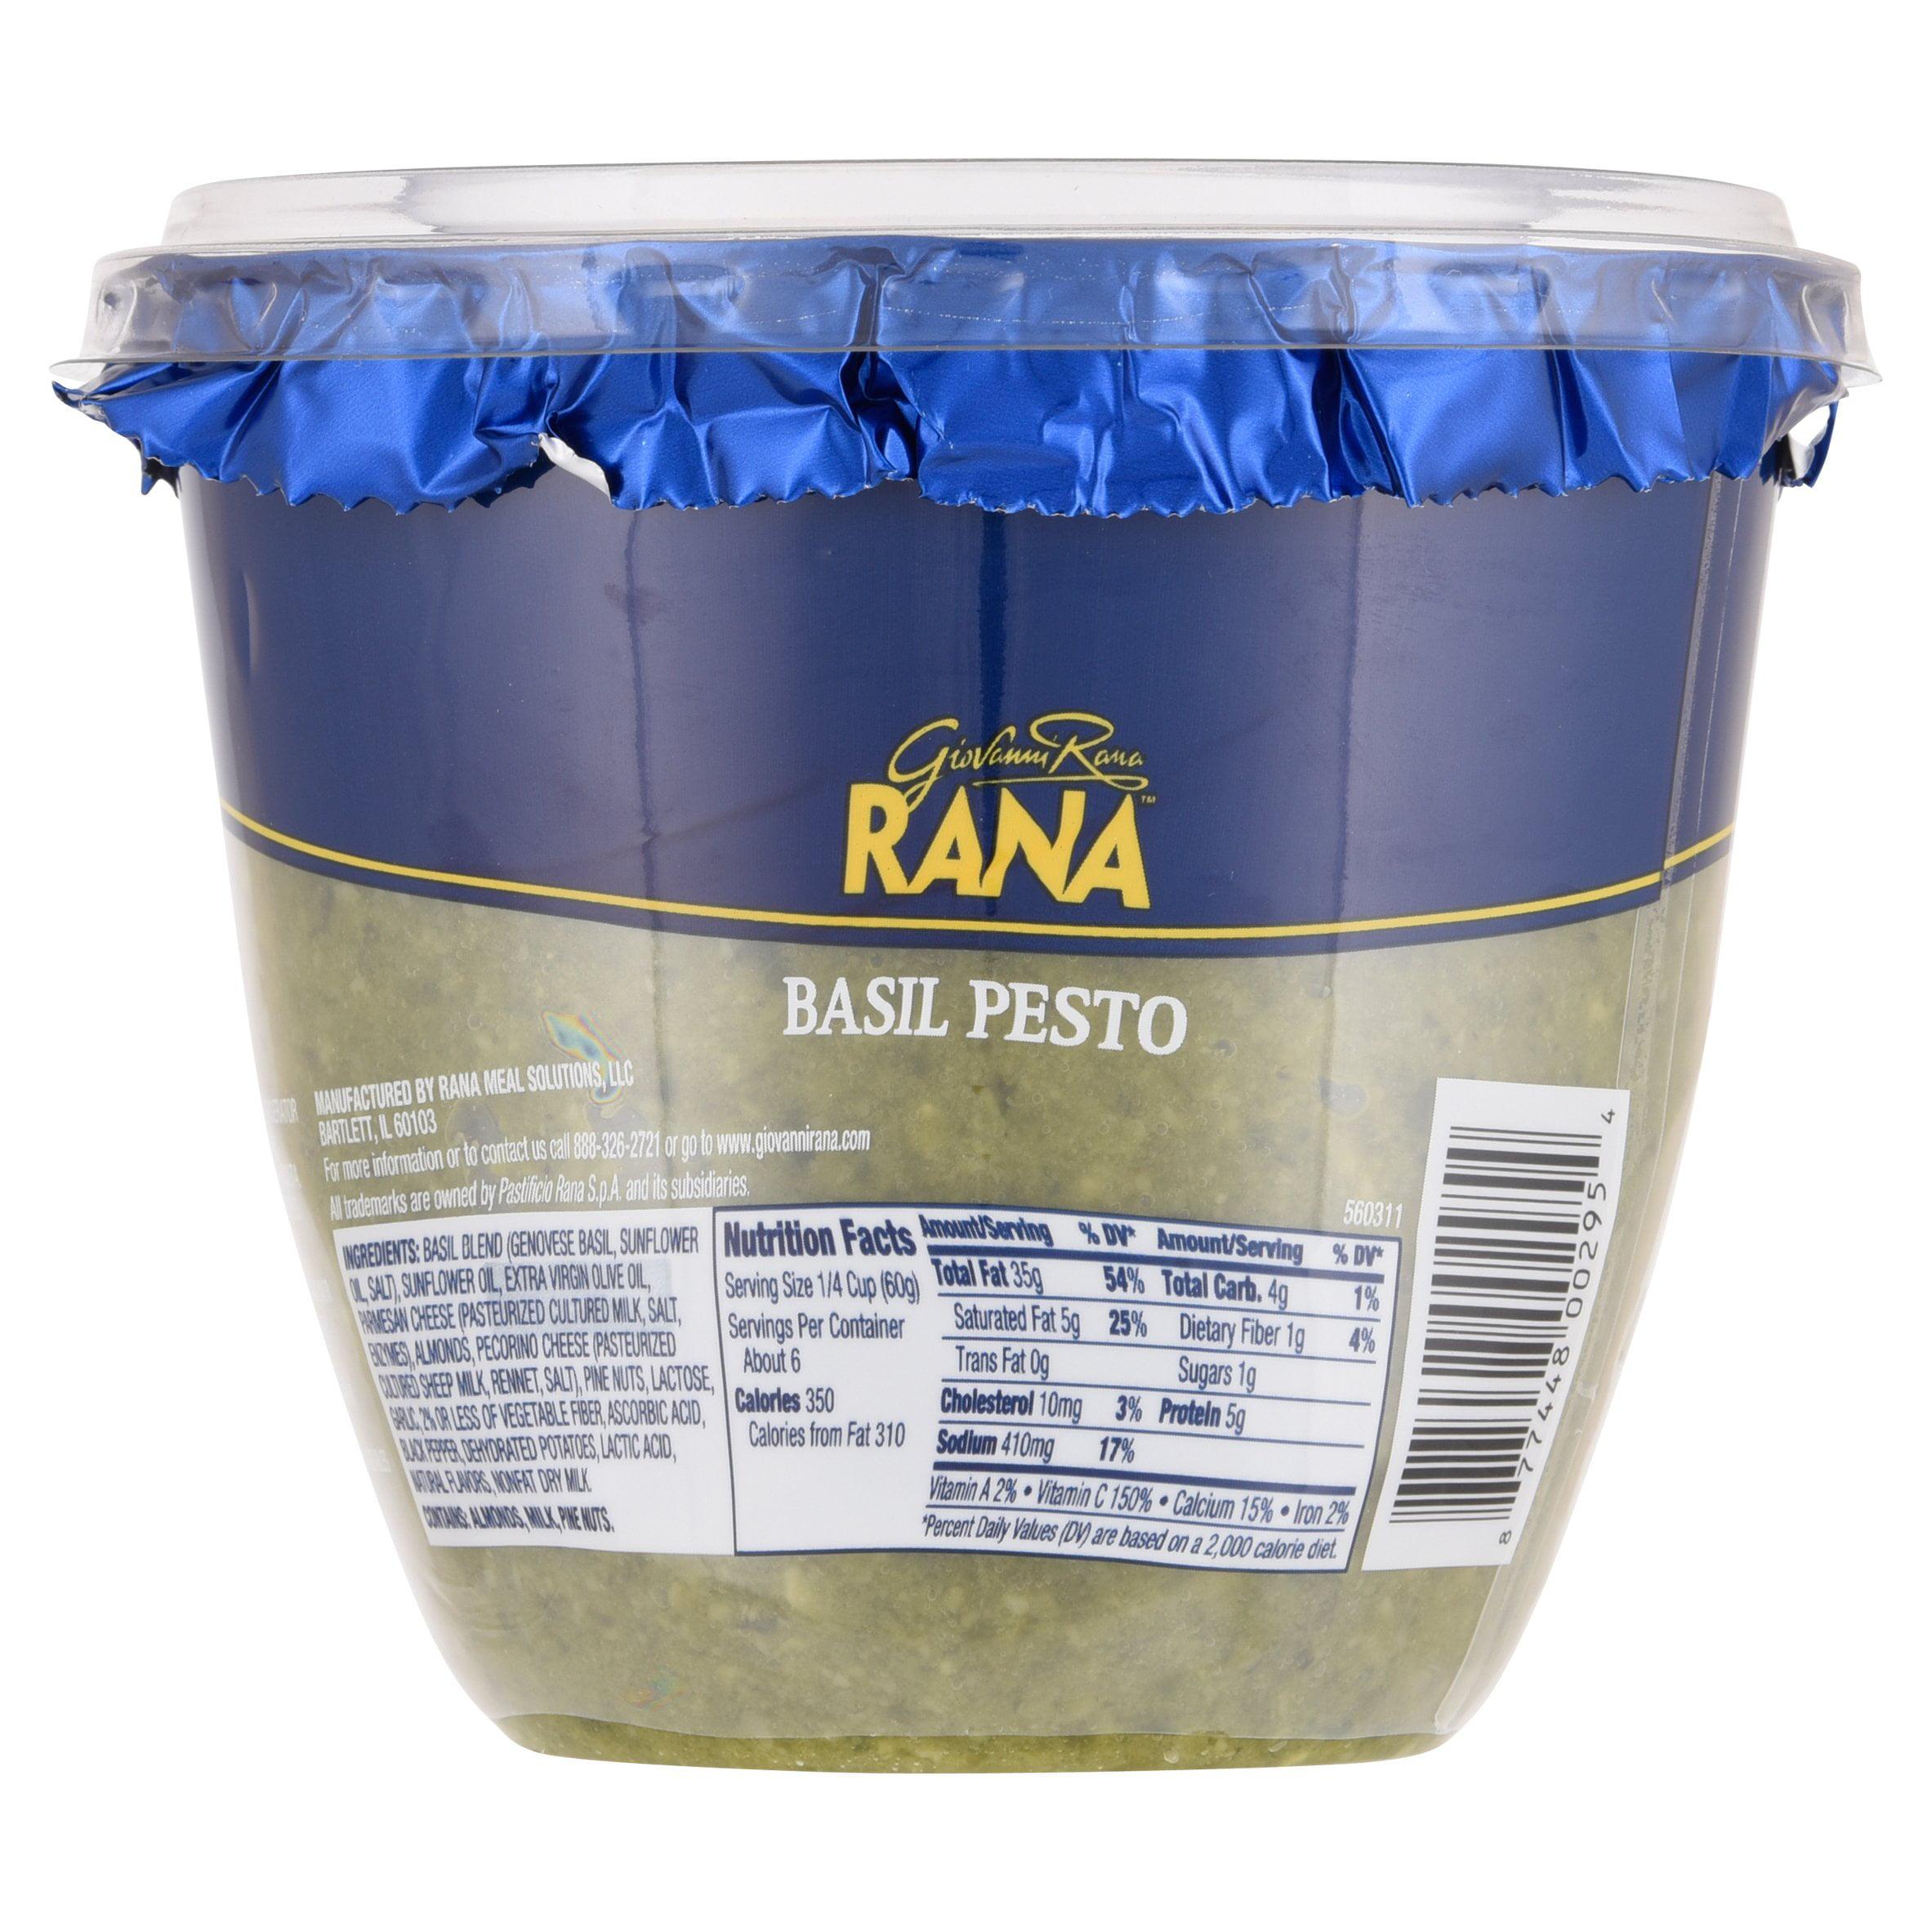 La Rana Furniture Bedroom Rana Basil Pesto Sauce Family Size 125 Oz Walmartcom